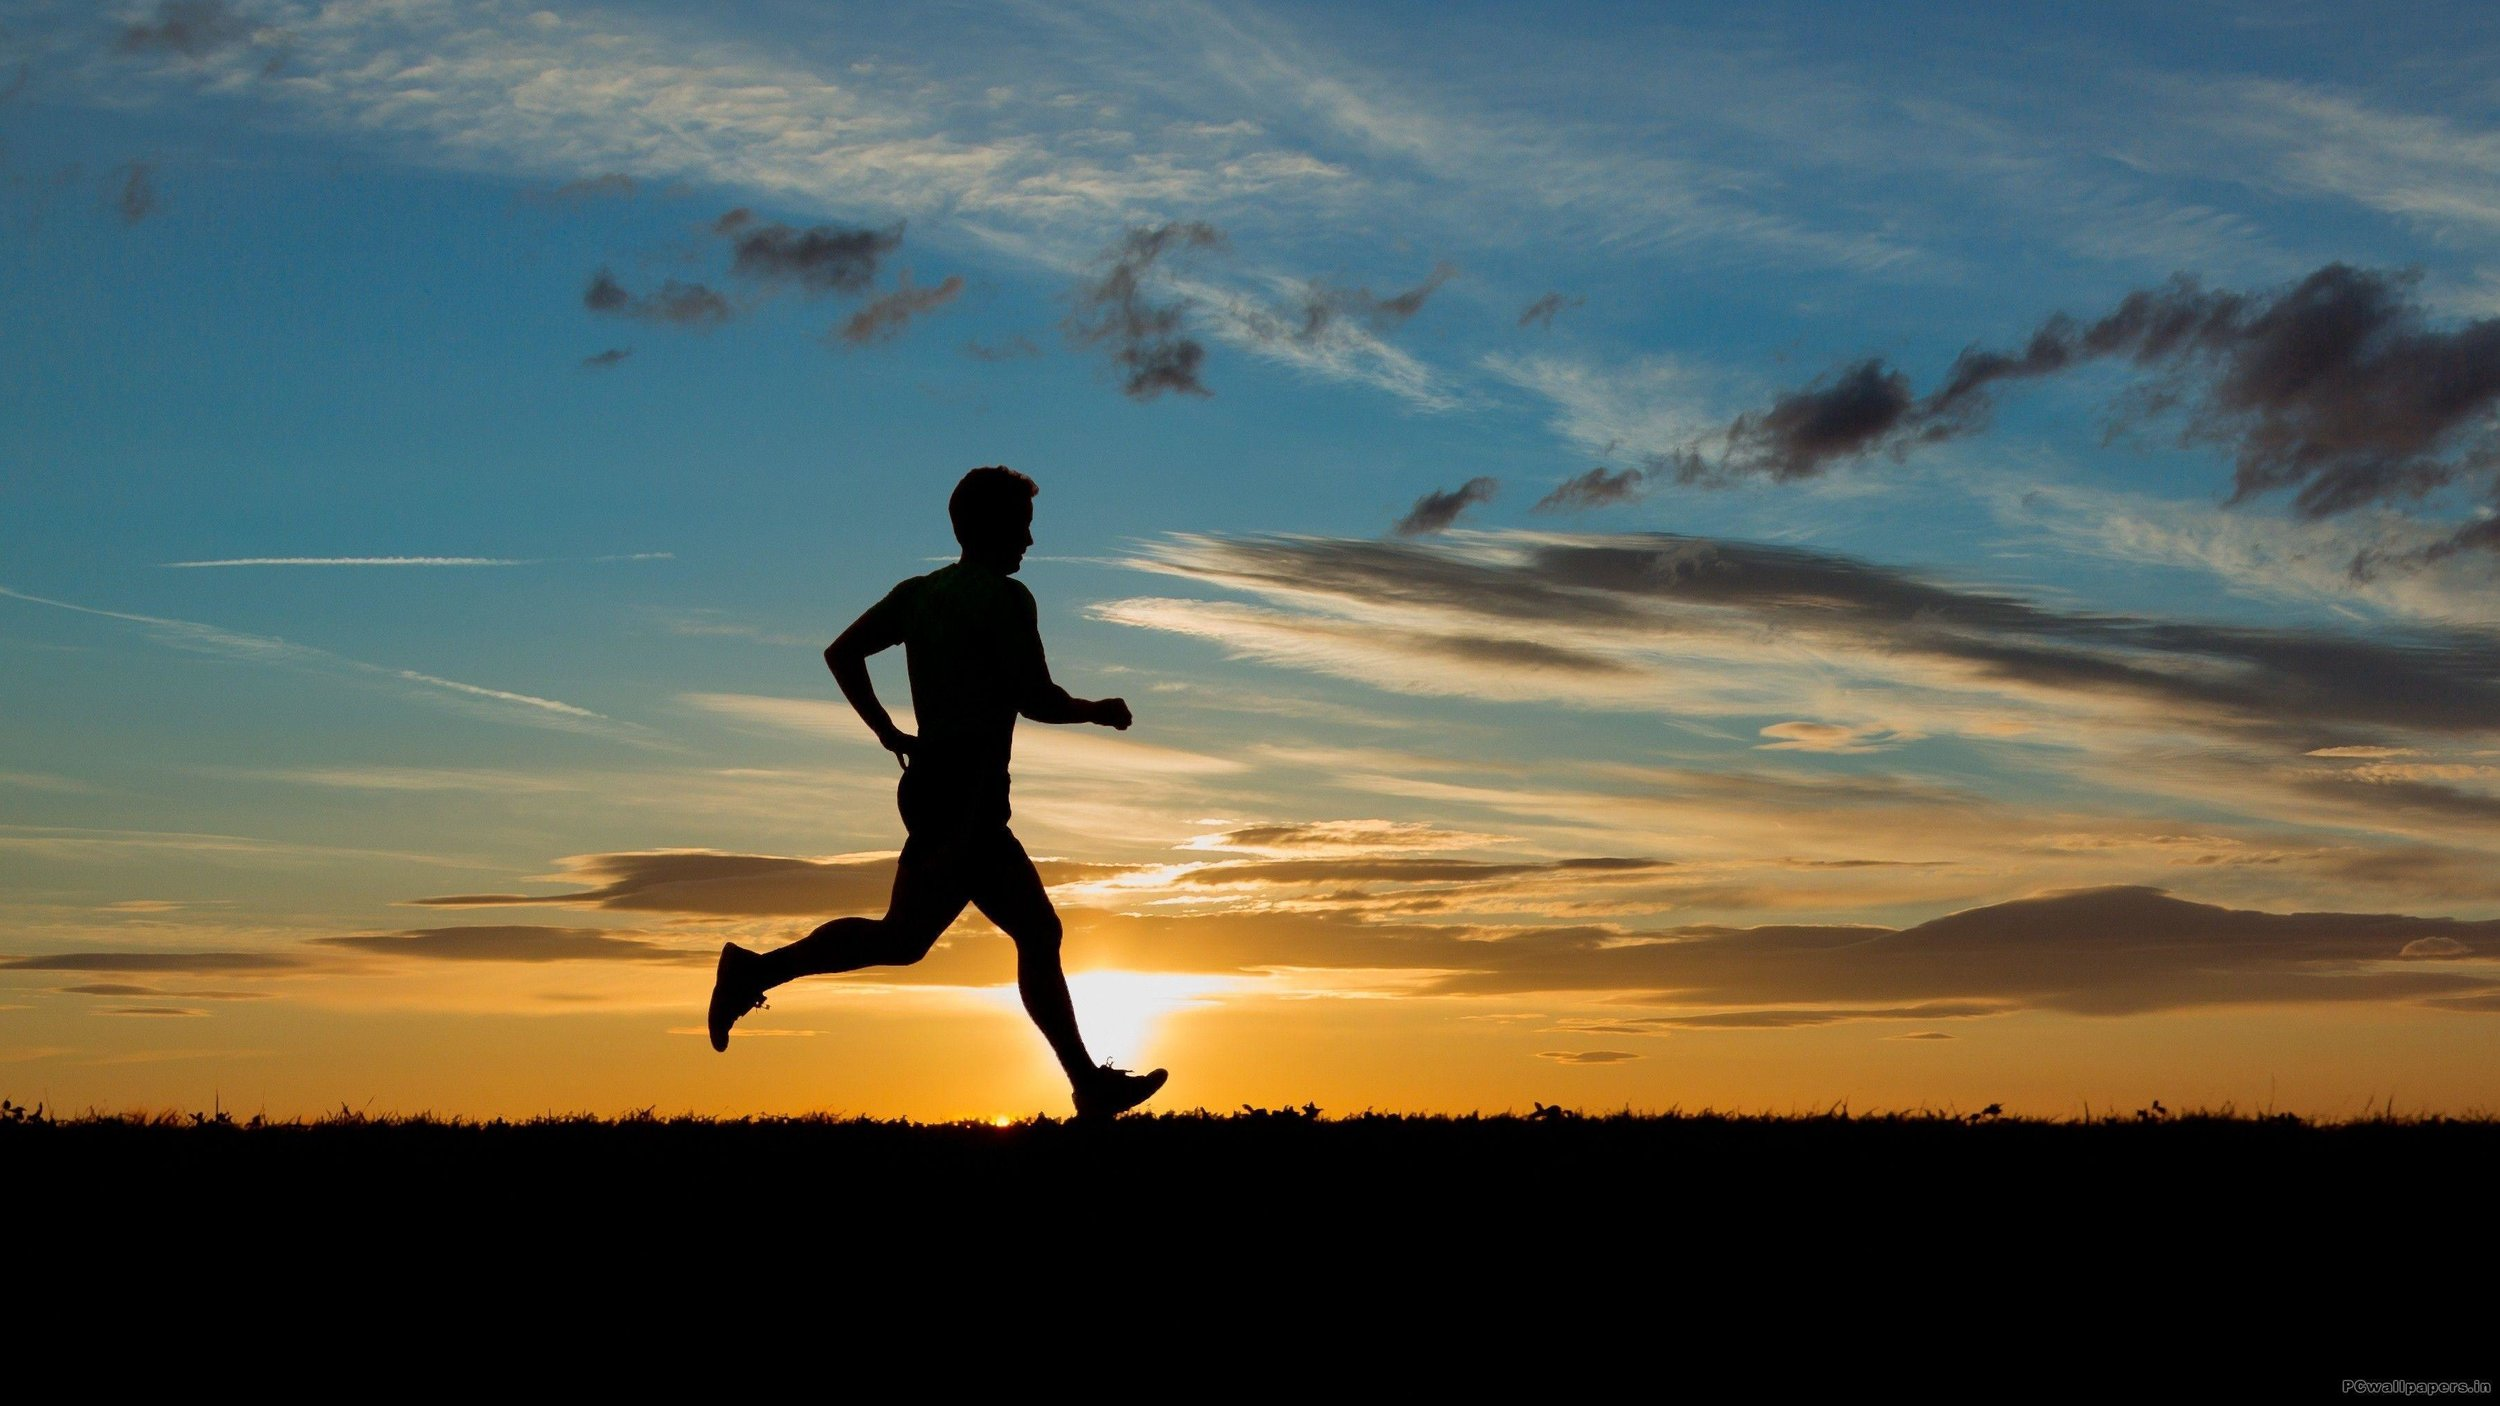 Industrial Design for Natural Running